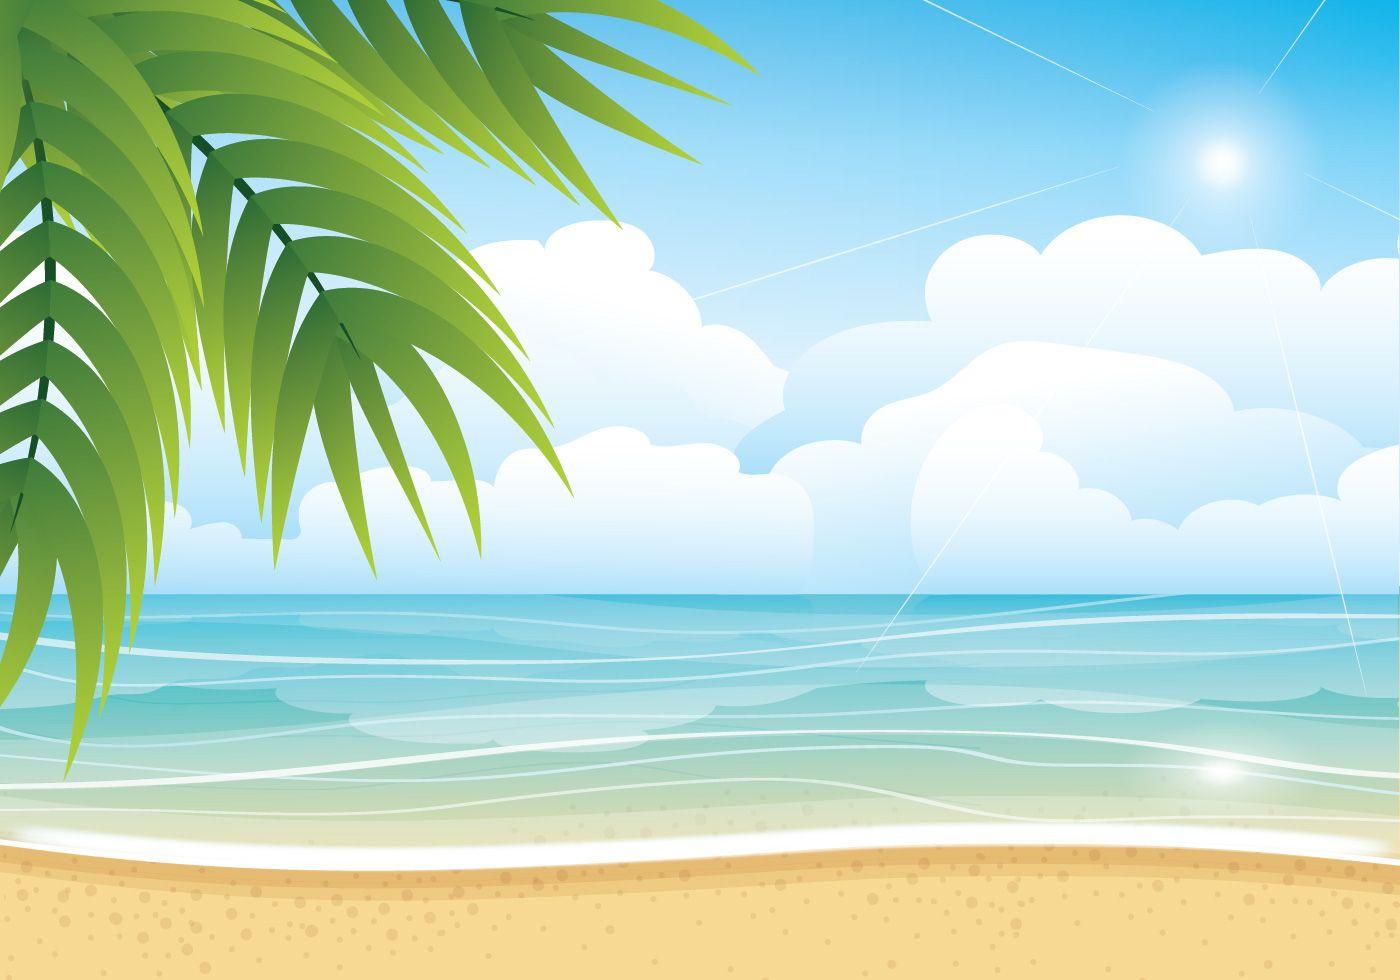 Tropical Summer Beach Vector Background